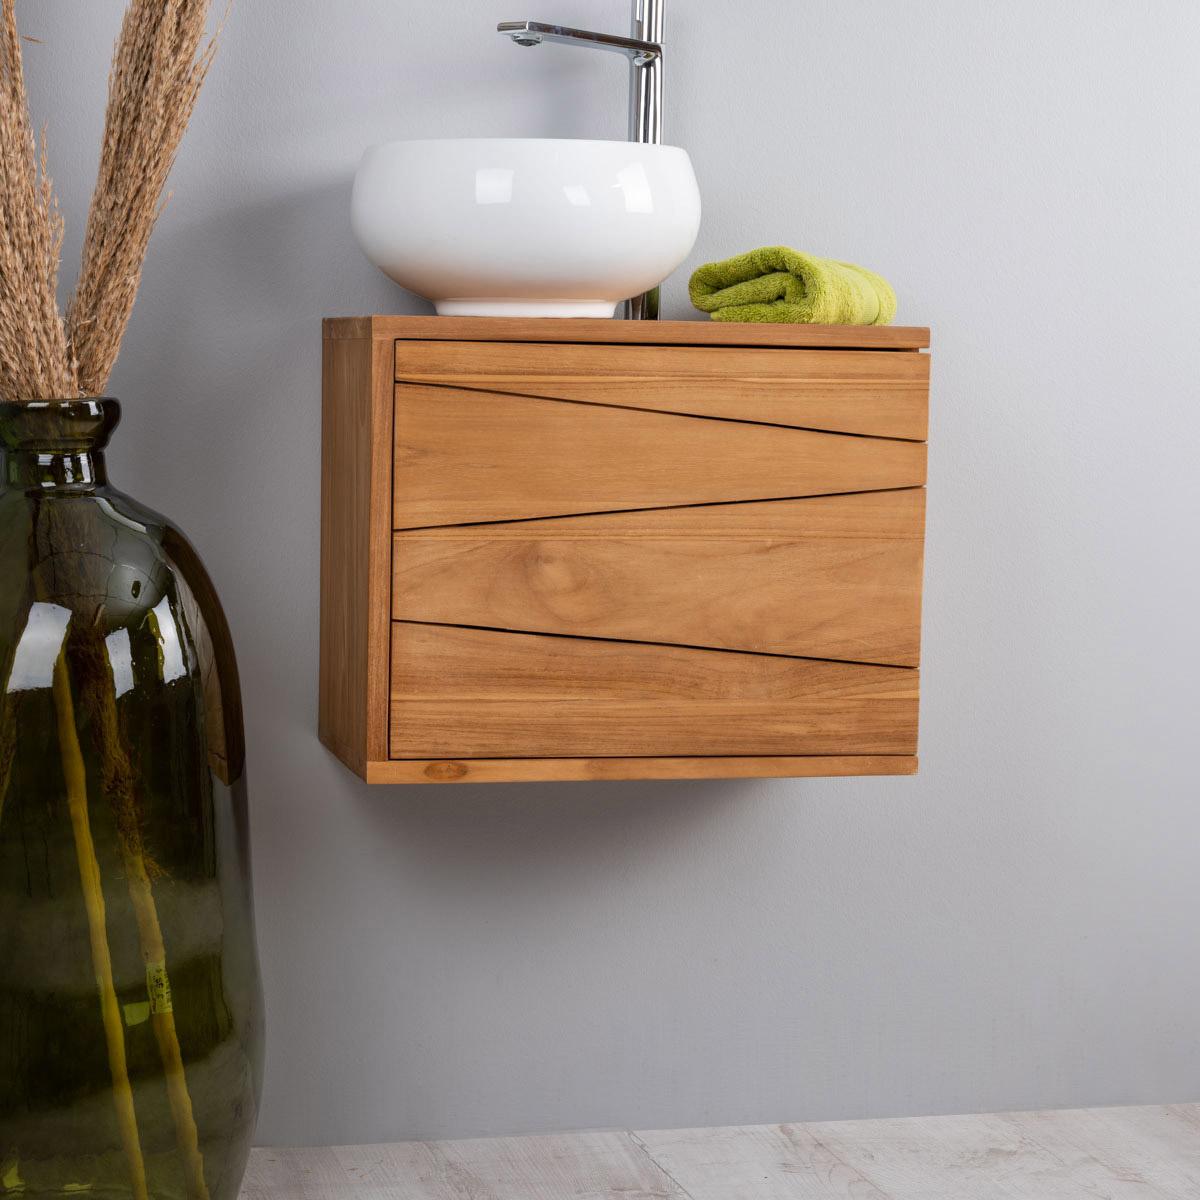 meuble sous vasque simple vasque suspendu en bois teck massif cosy rectangle naturel l. Black Bedroom Furniture Sets. Home Design Ideas